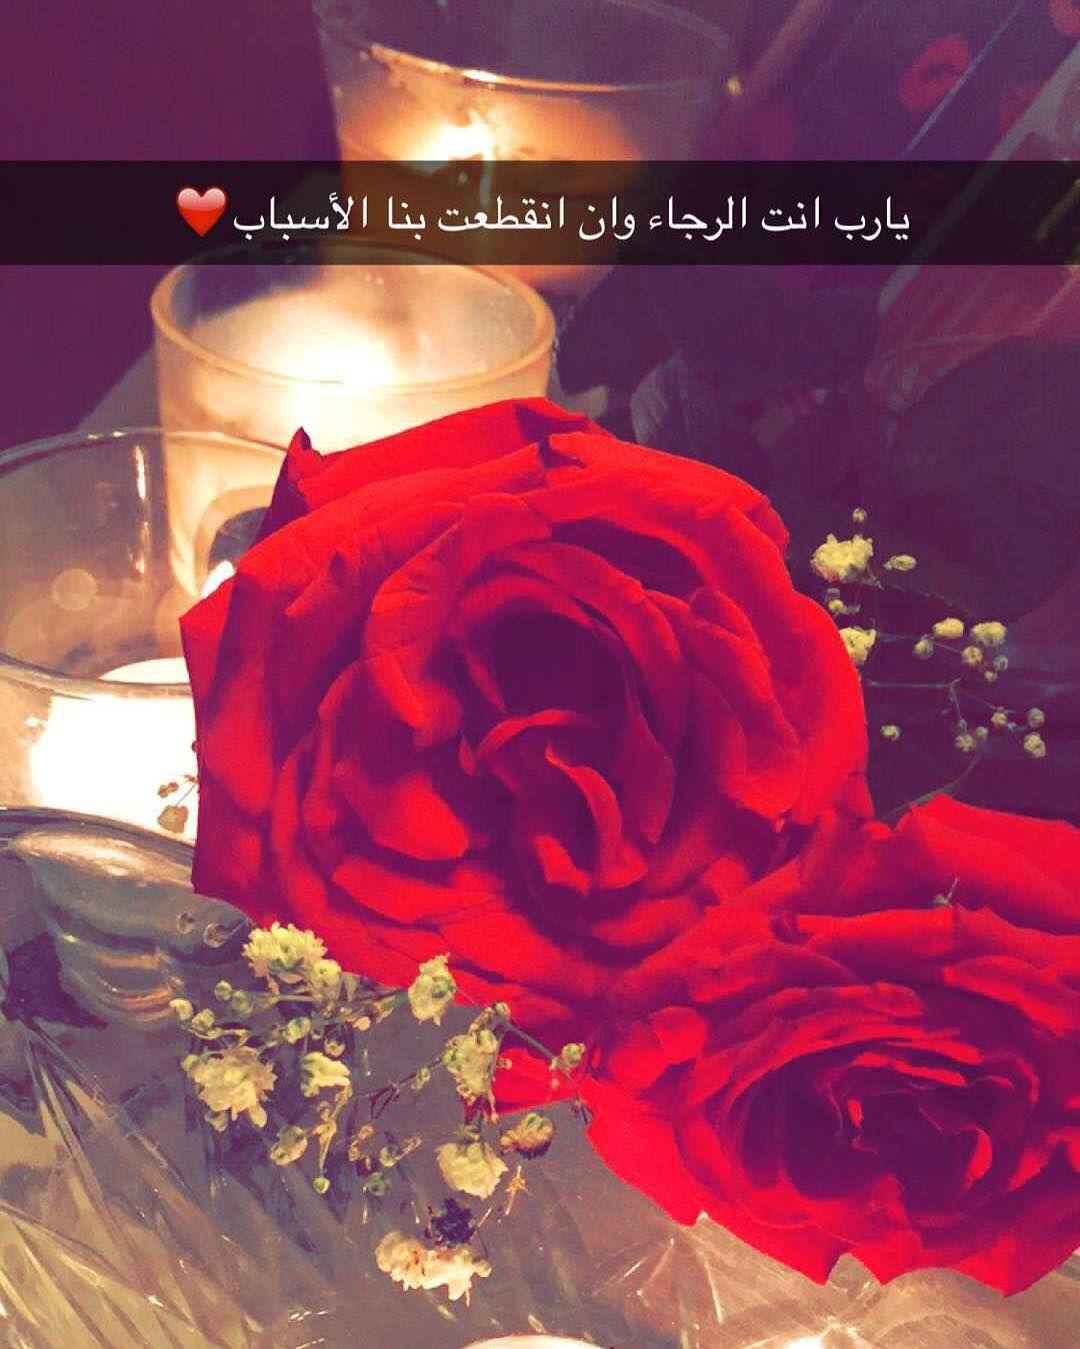 Instagram Photo By Roaa Abdalhaleem Apr 11 2016 At 10 49pm Utc Instagram Posts Instagram Instagram Photo